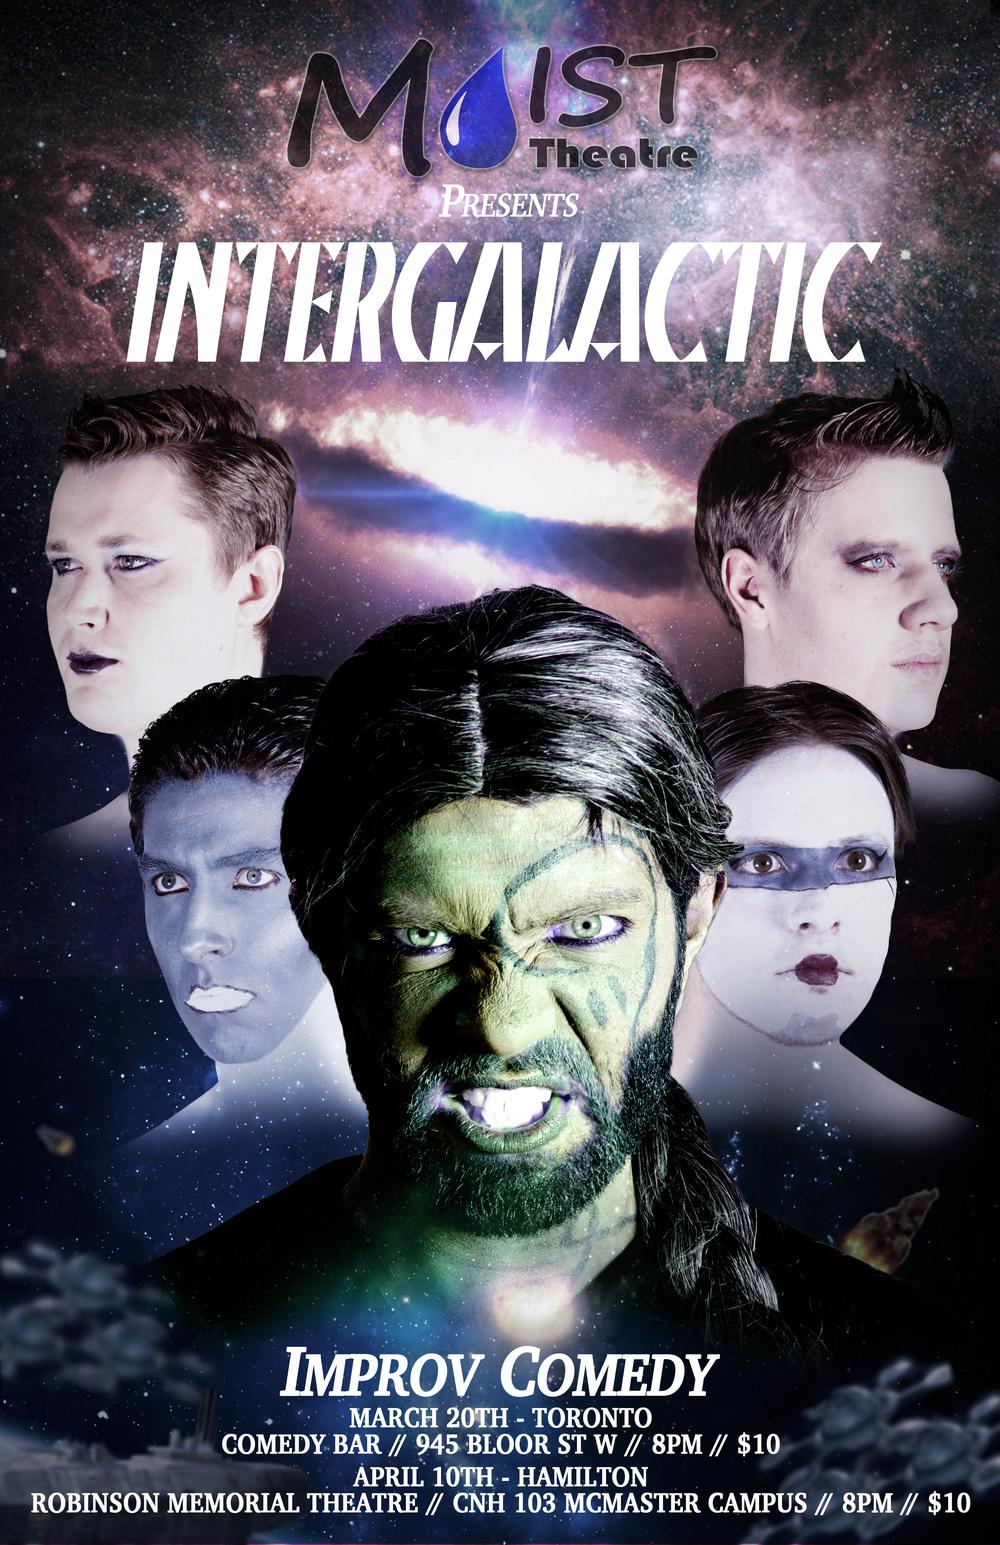 Intergalactic Poster.jpg